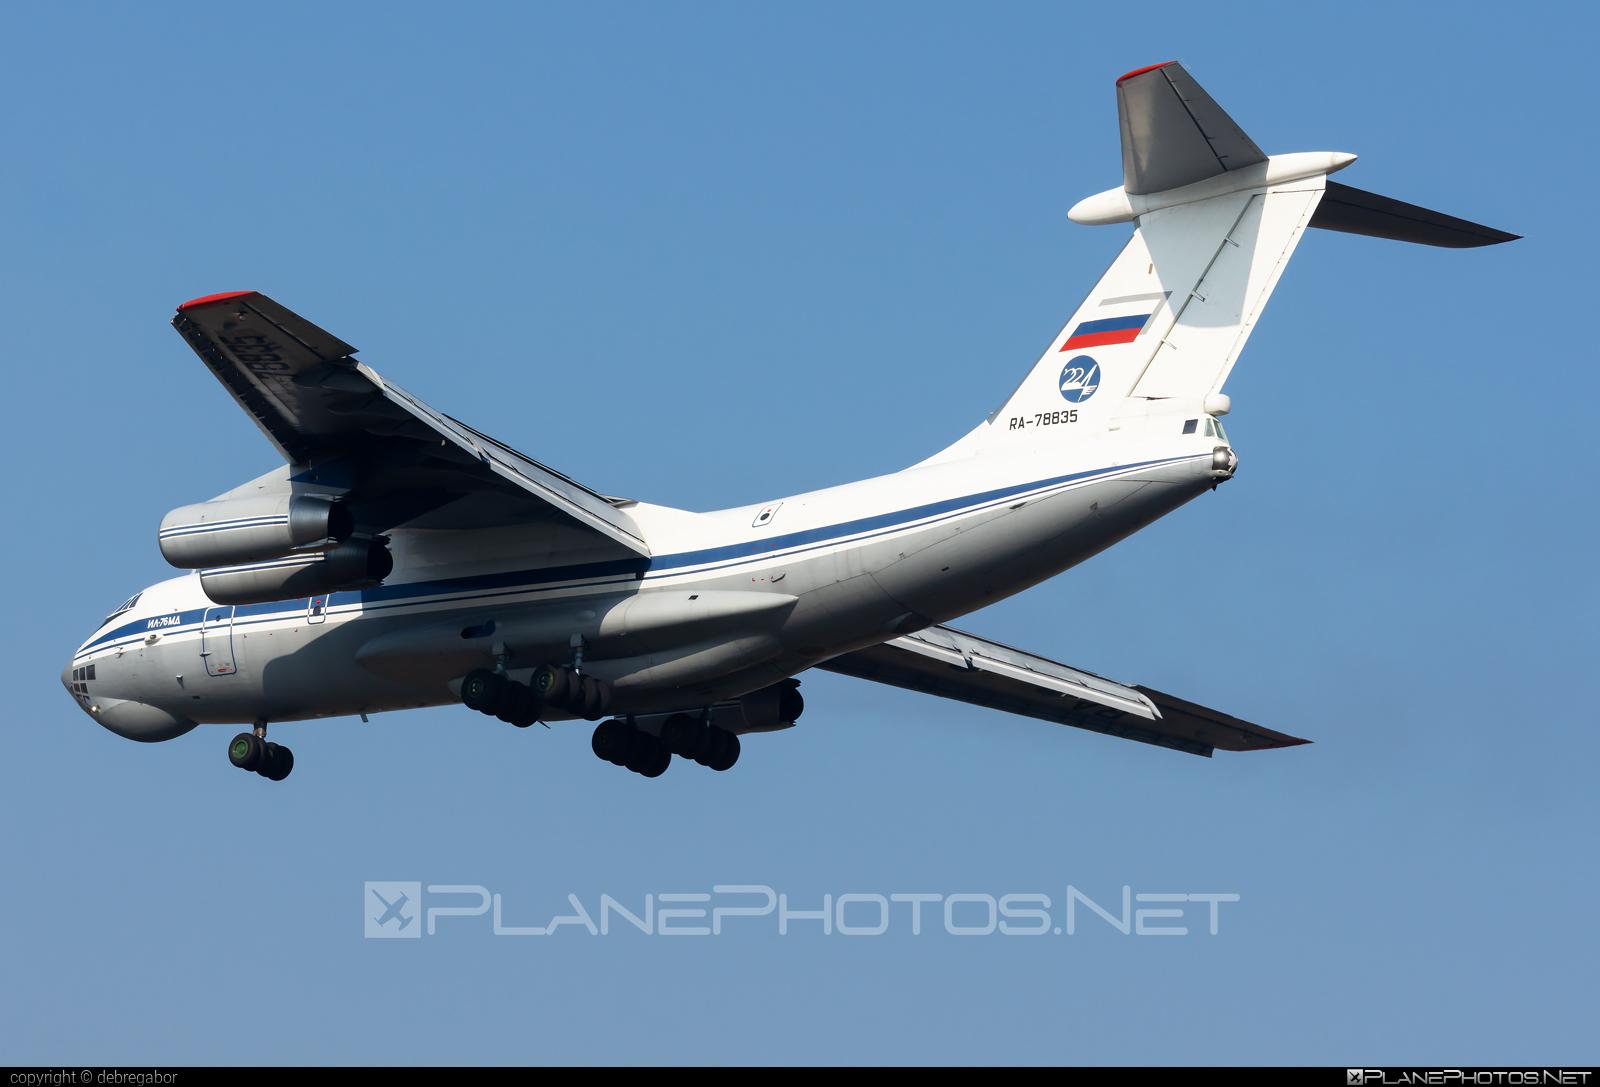 Ilyushin Il-76MD - RA-78835 operated by Voyenno-vozdushnye sily Rossii (Russian Air Force) #il76 #il76md #ilyushin